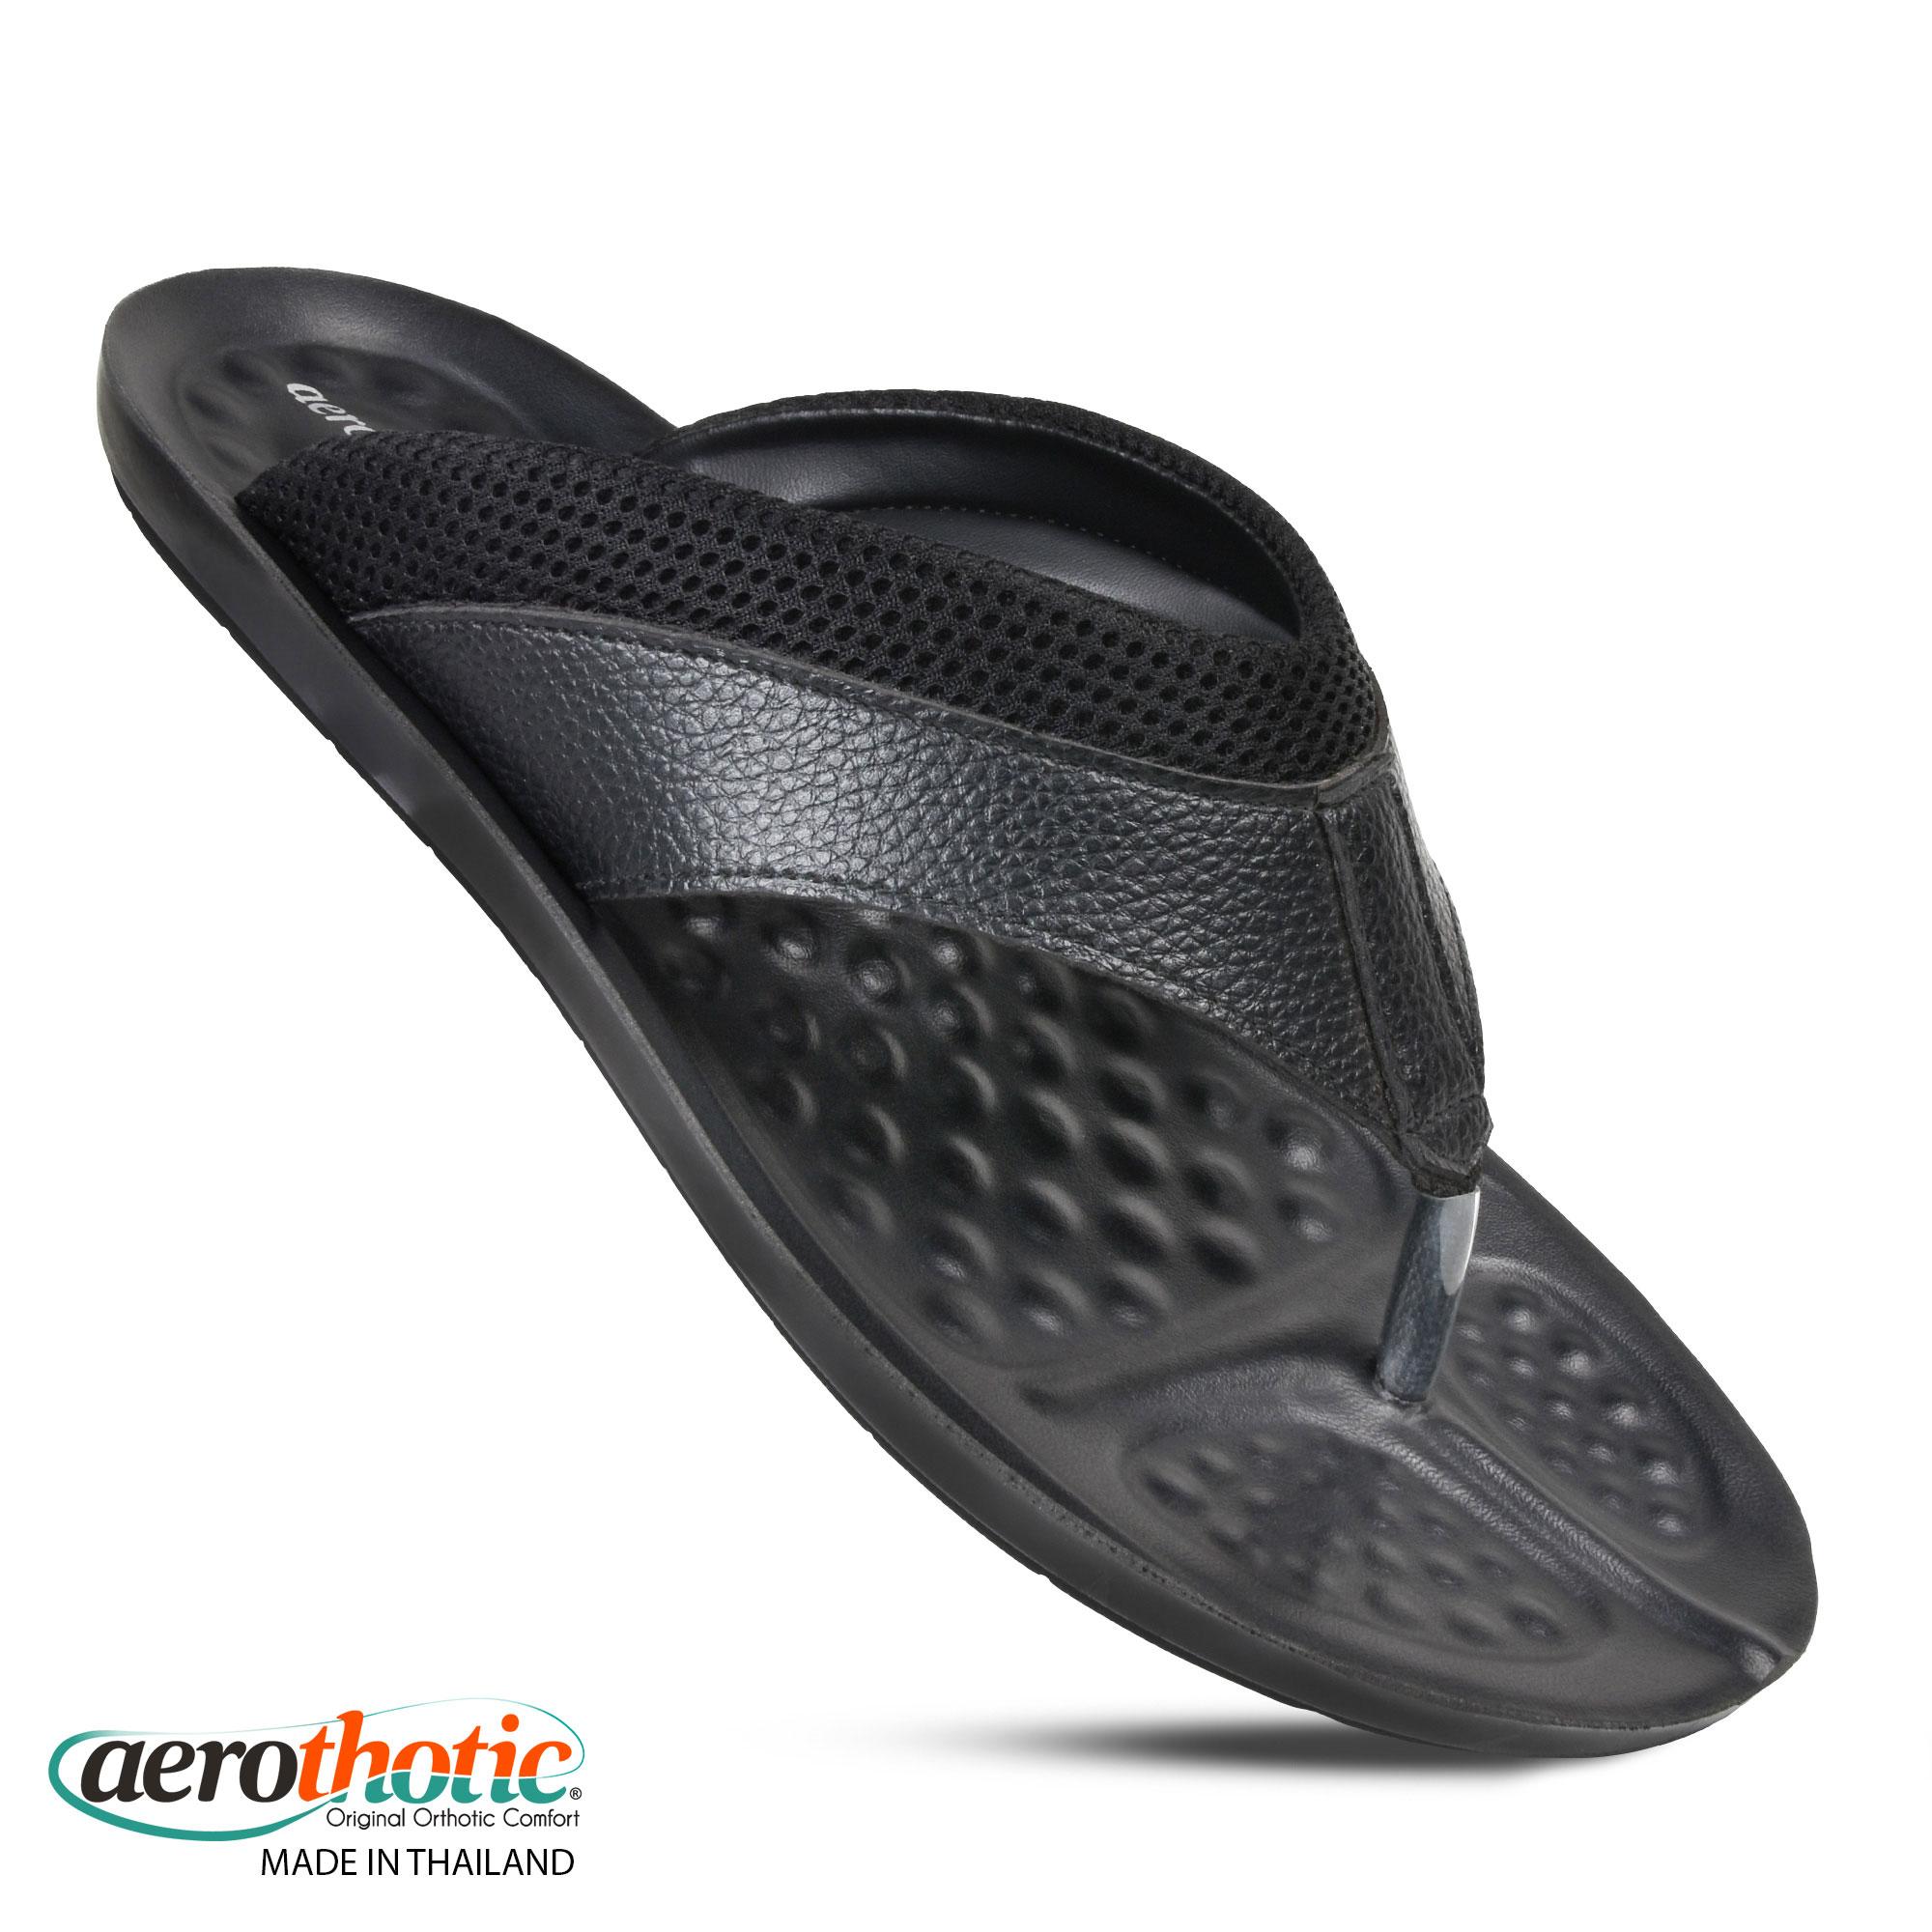 AEROTHOTIC Men's Comfortable Stylish Sandals - Original Thailand Imported - M0705